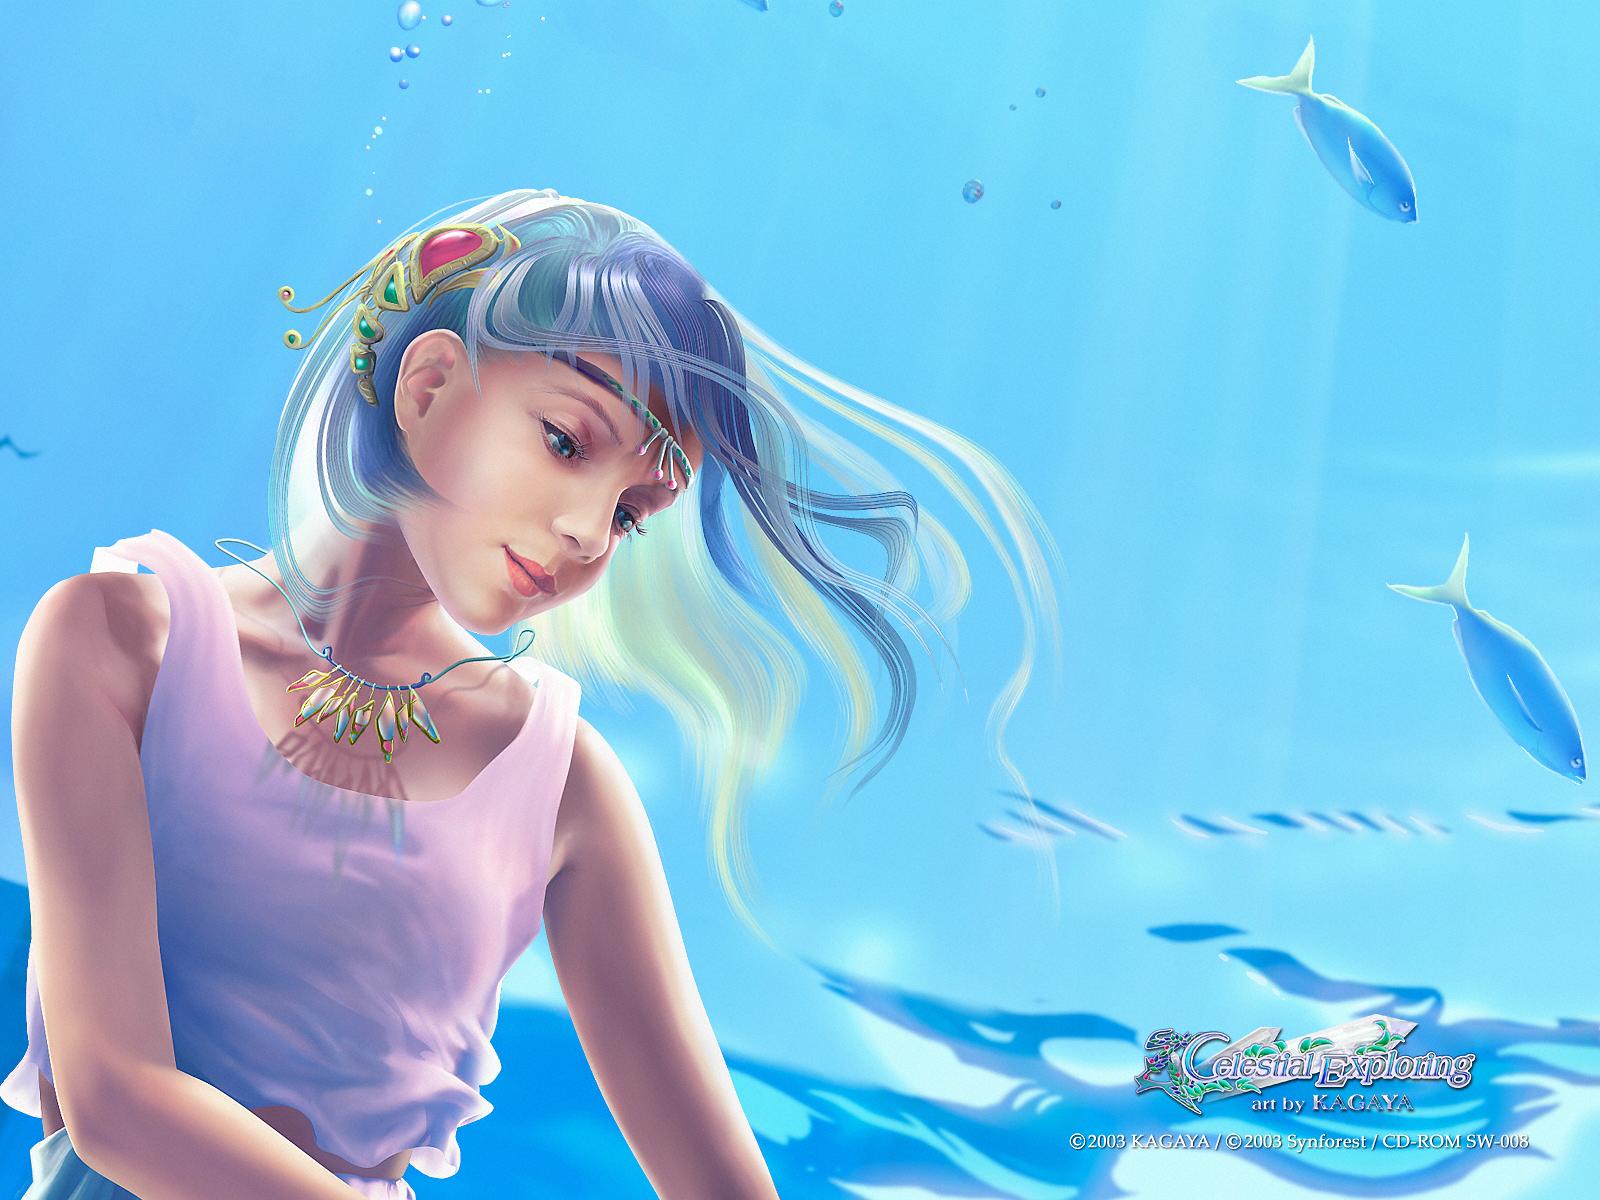 KAGAYA Celestial Exploring Infinity, Inspiration